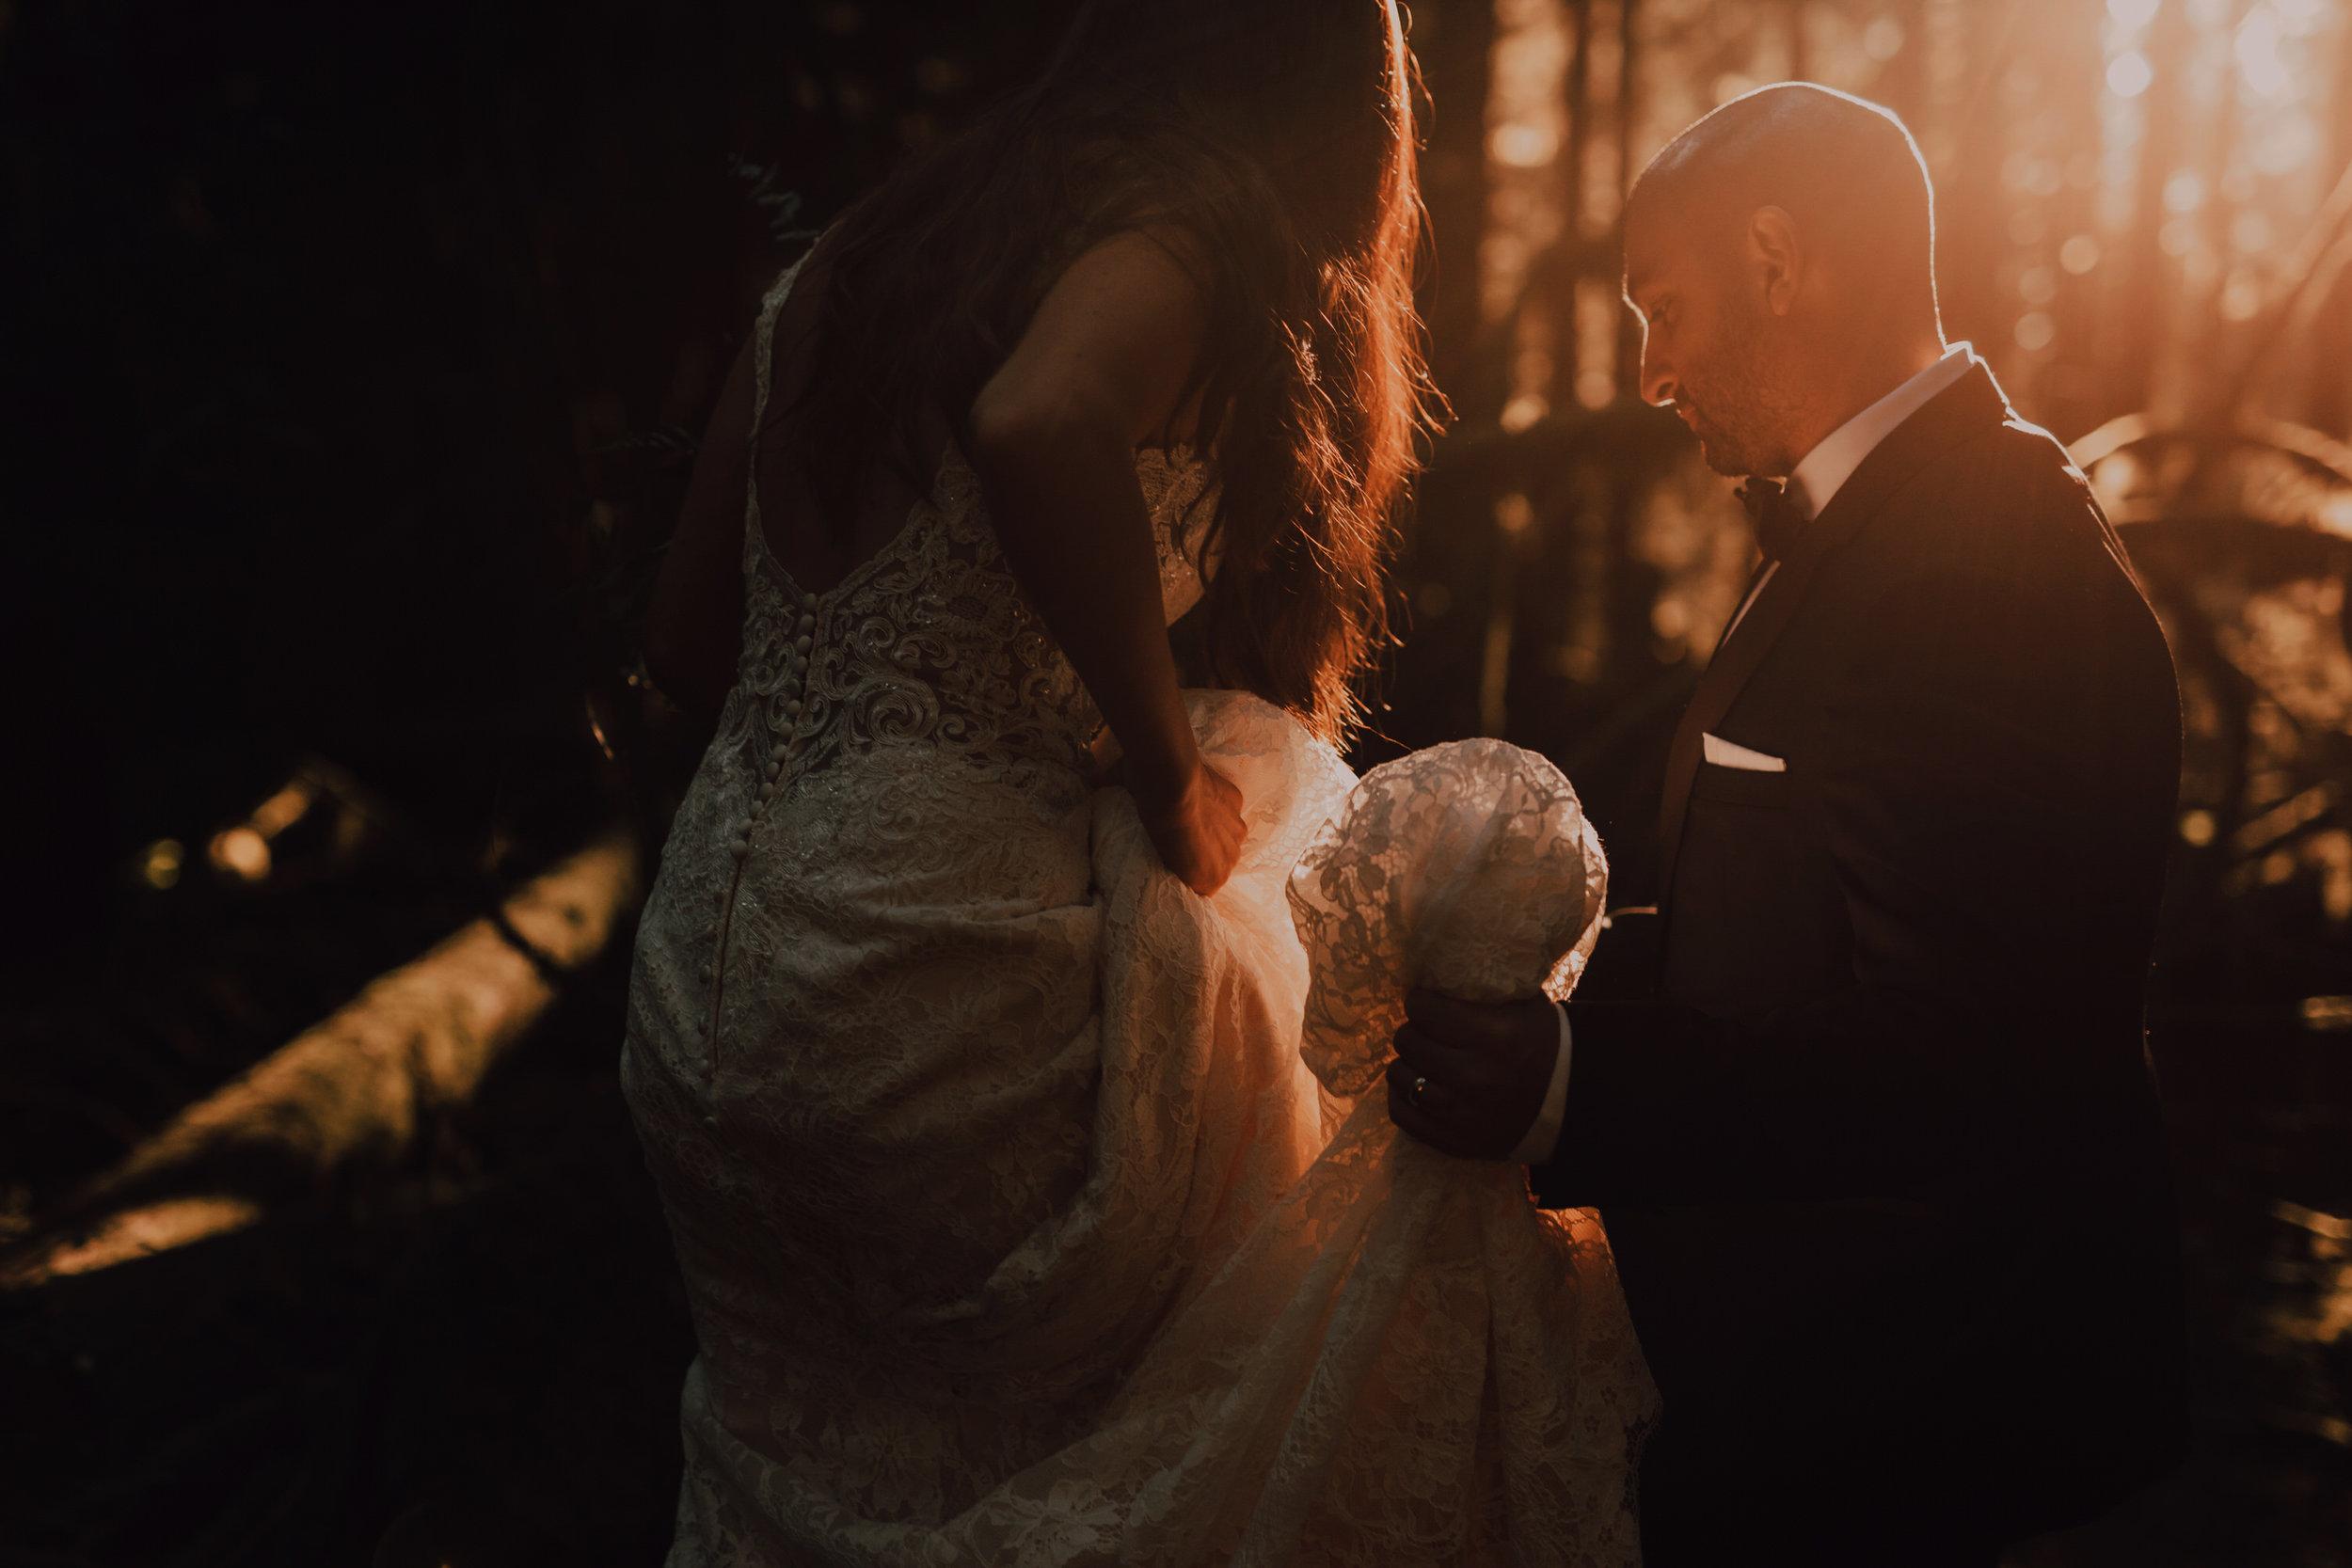 Day After Wedding Photos - Sunshine Coast Wedding Photos - Sunset Wedding Photos - Vancouver Wedding Photographer & Videographer - Sunshine Coast Wedding Photos - Sunshine Coast Wedding Photographer - Jennifer Picard Photography - 1A5A8009.jpg